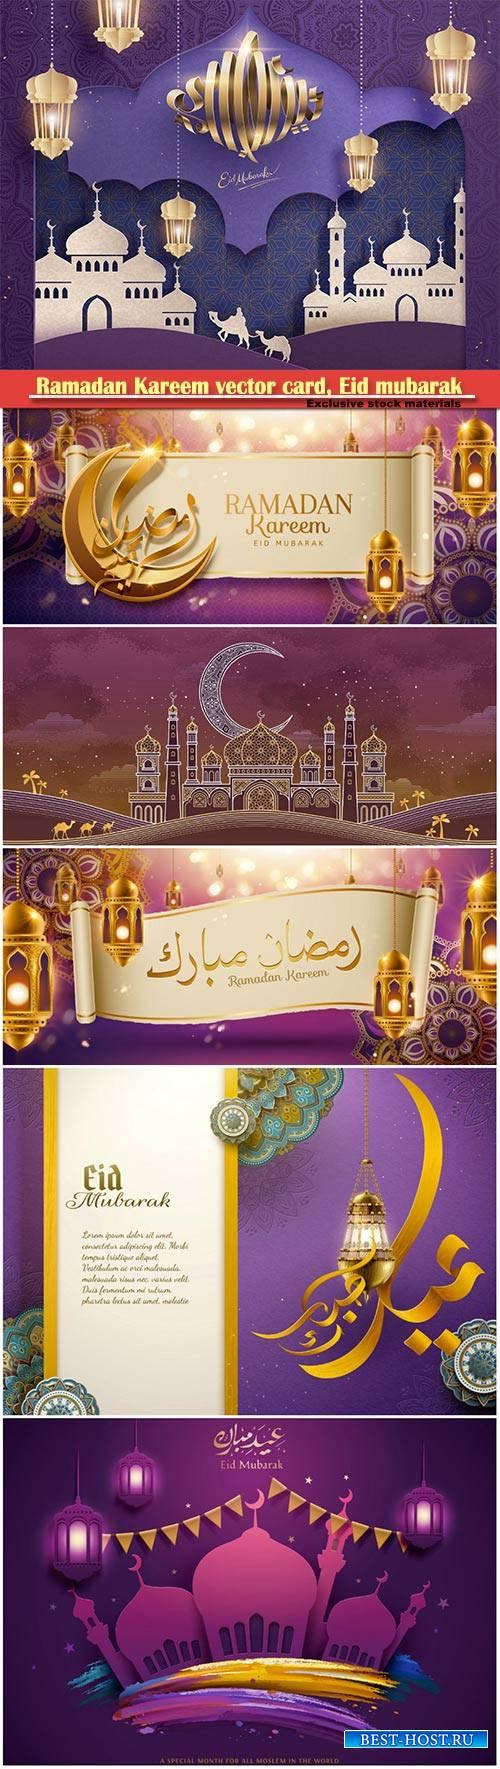 Ramadan Kareem vector card, Eid mubarak calligraphy design templates # 30